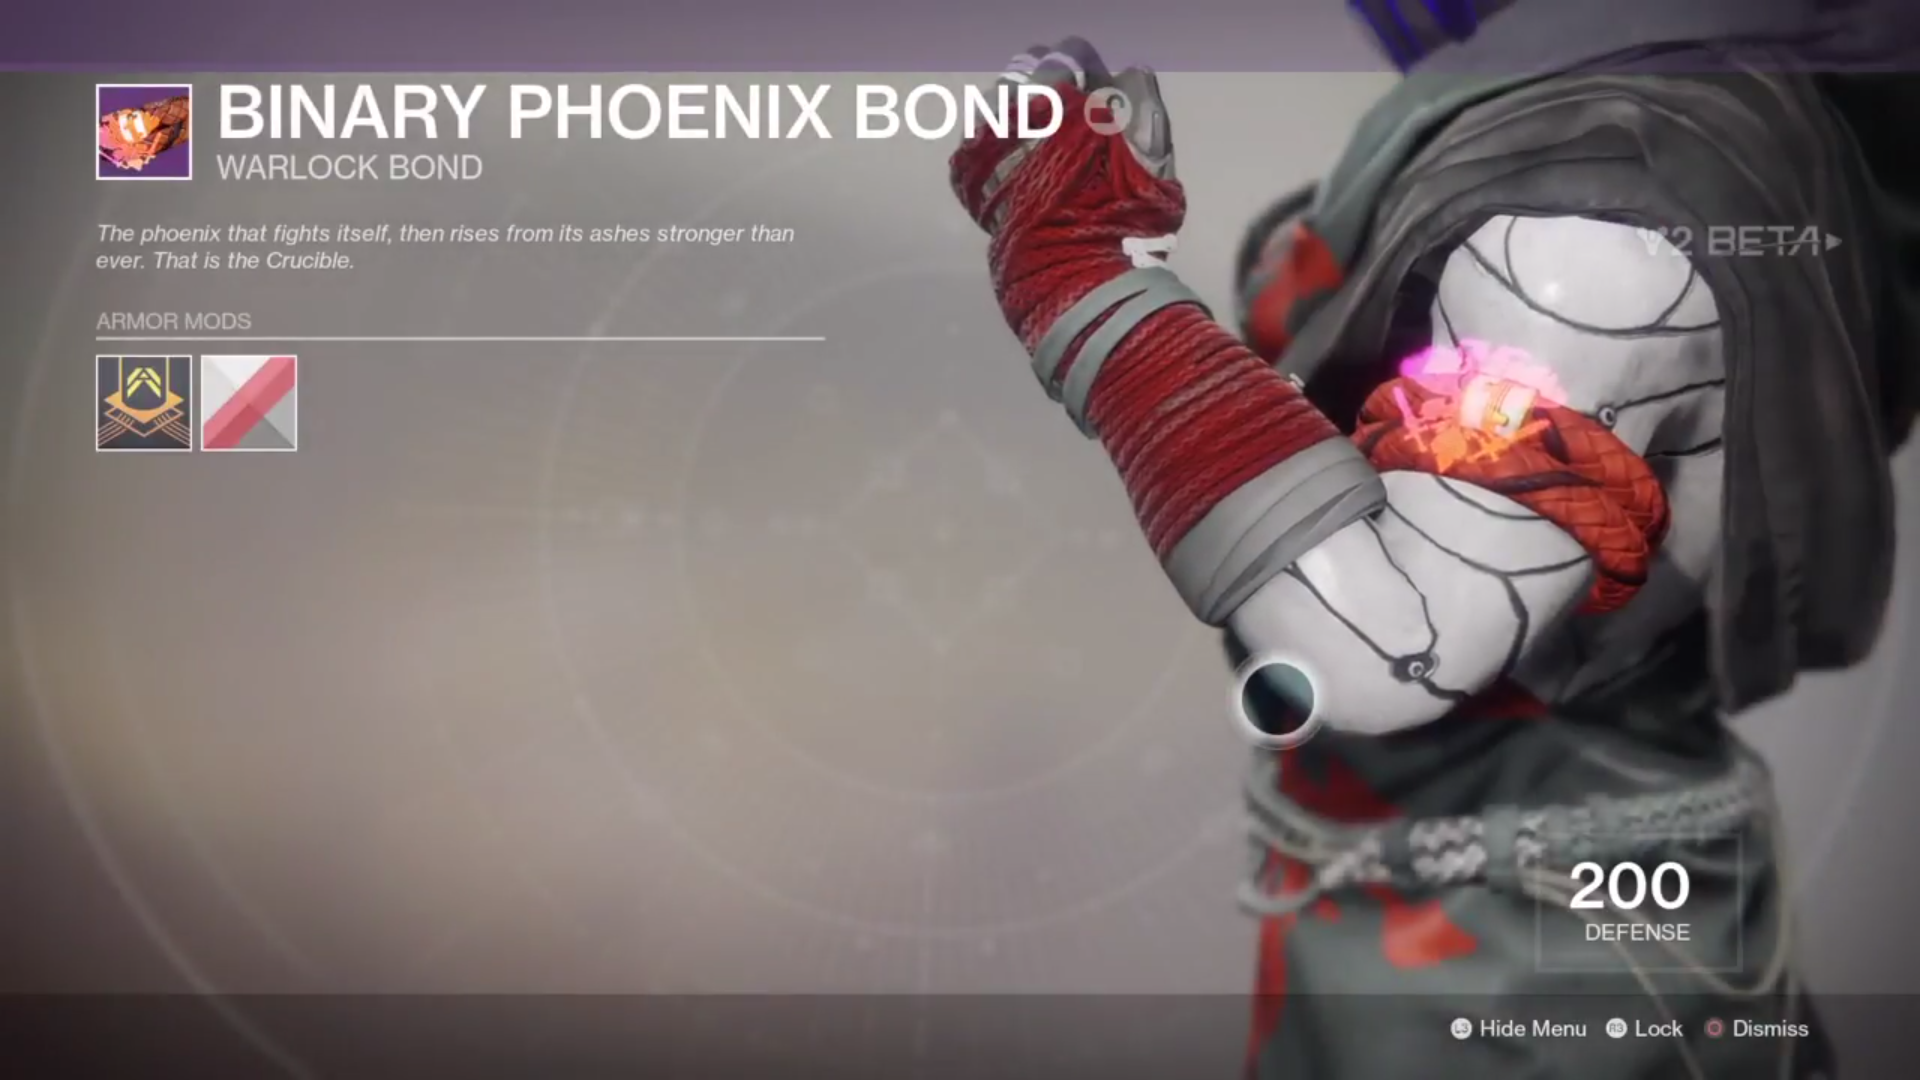 destiny 2 beta binary phoenix bond